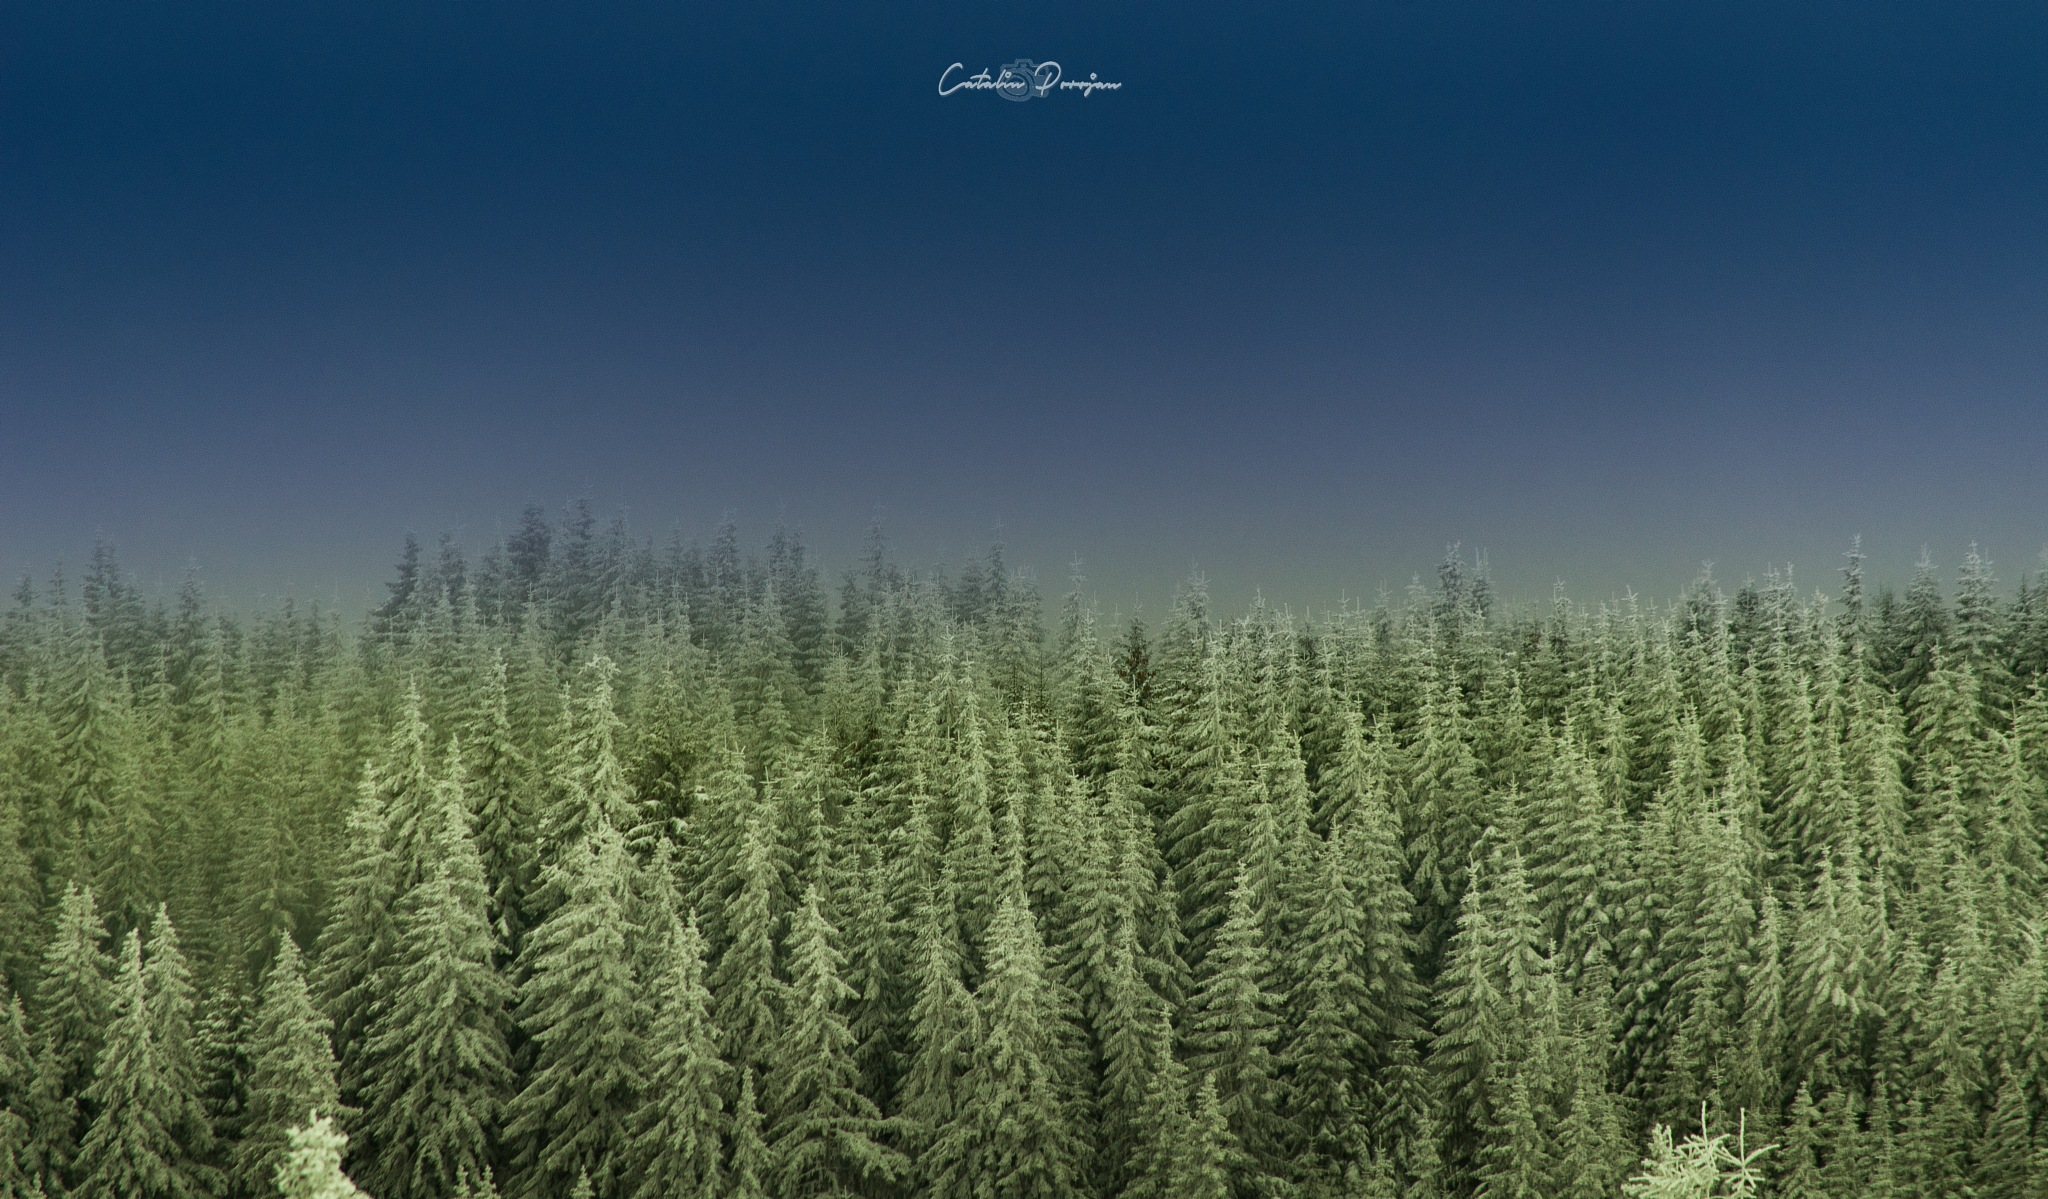 My beautiful Romania - trees of Christmas  by Catalin Porojan